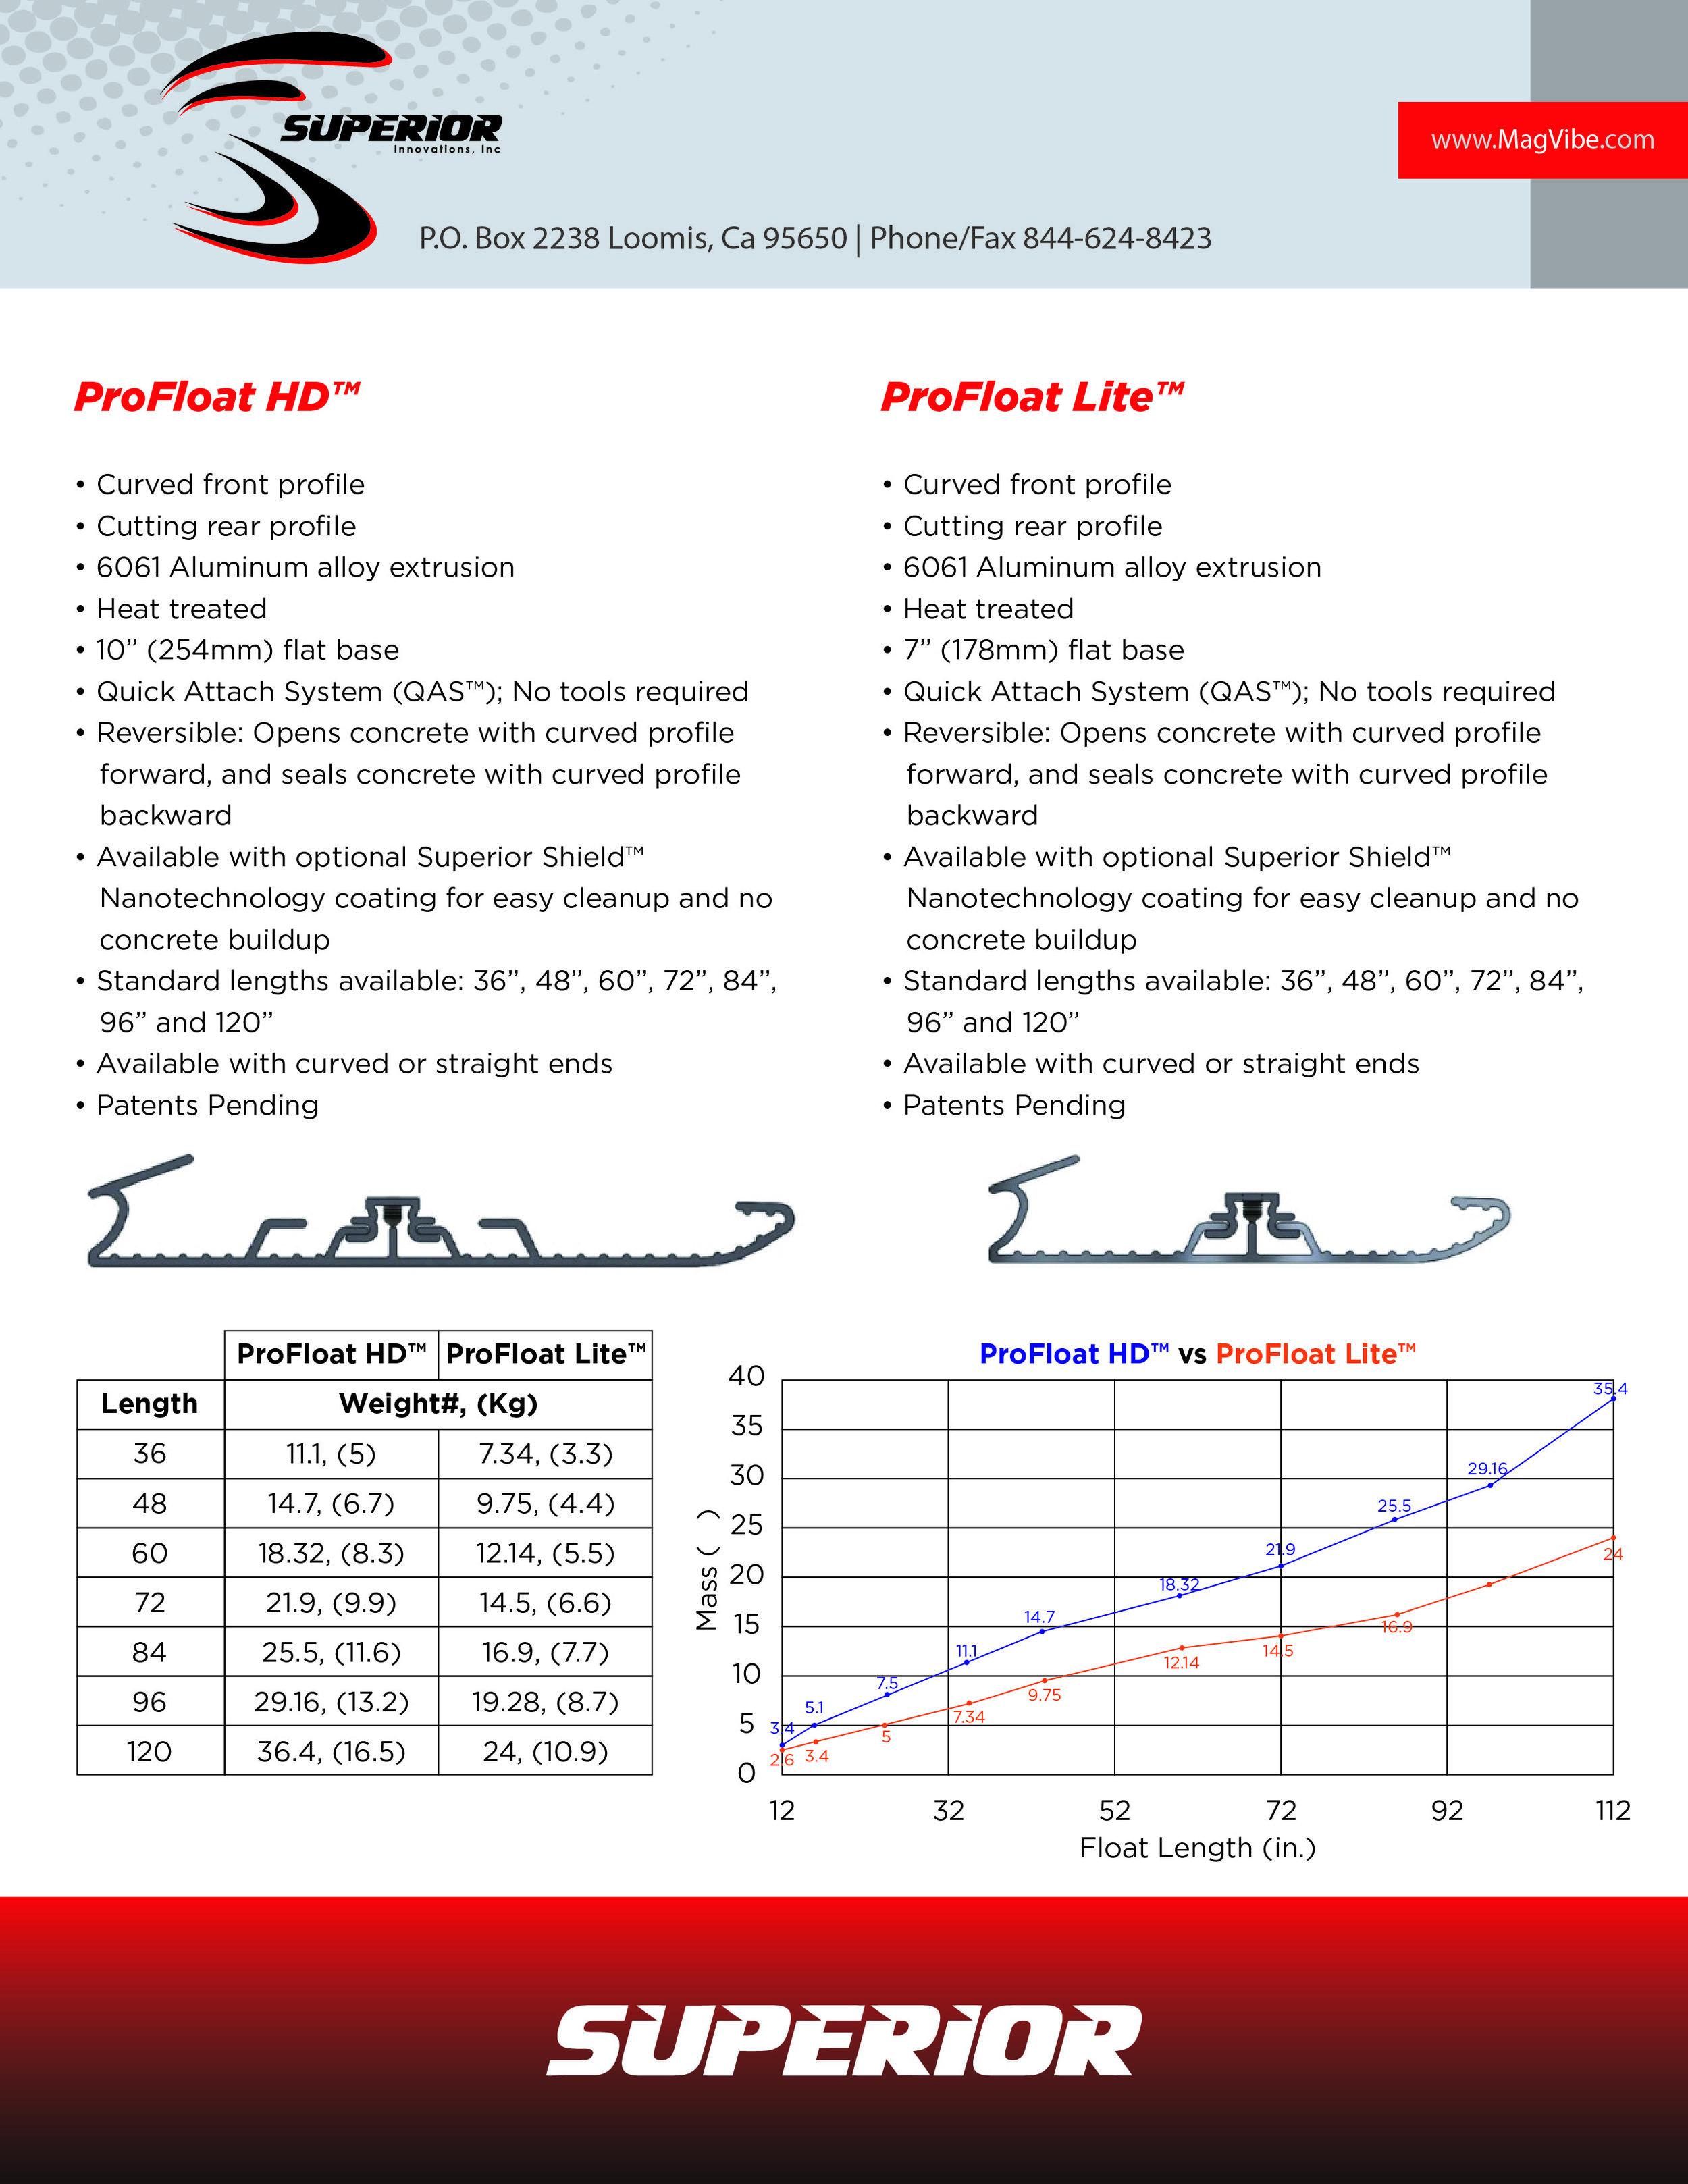 Pro Float Heavy — Superior Innovations, Inc